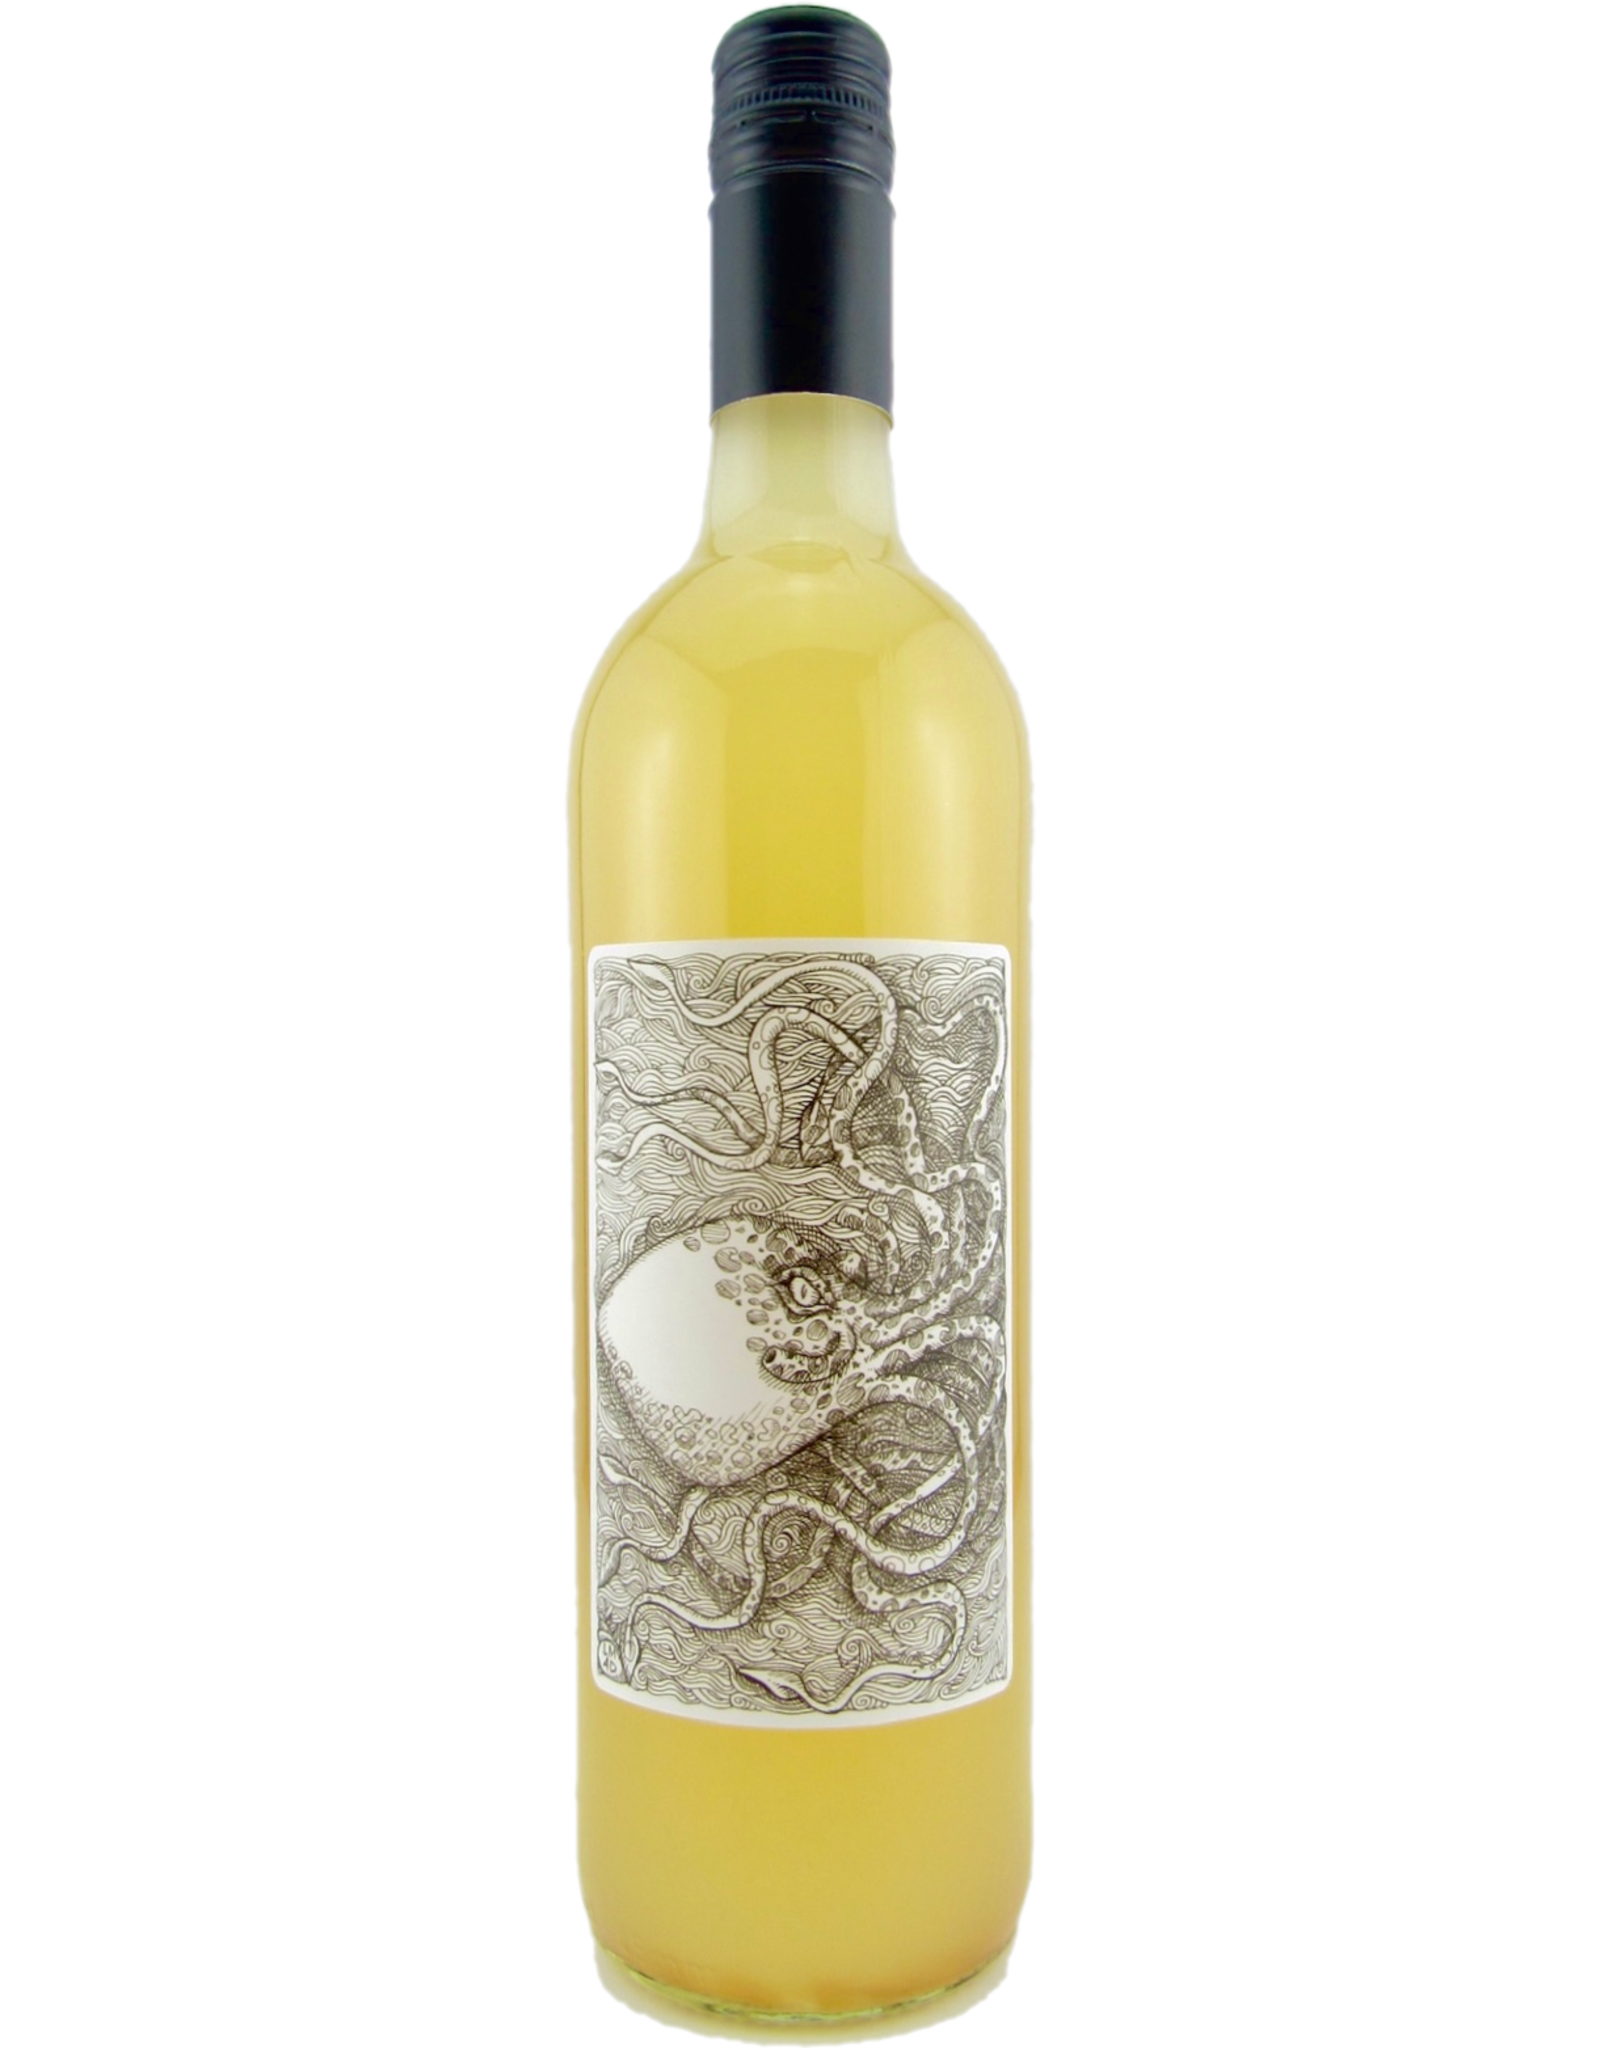 Fluture Wines Fluture Wines The Octopus Viognier Piquette, Middleburg 2020